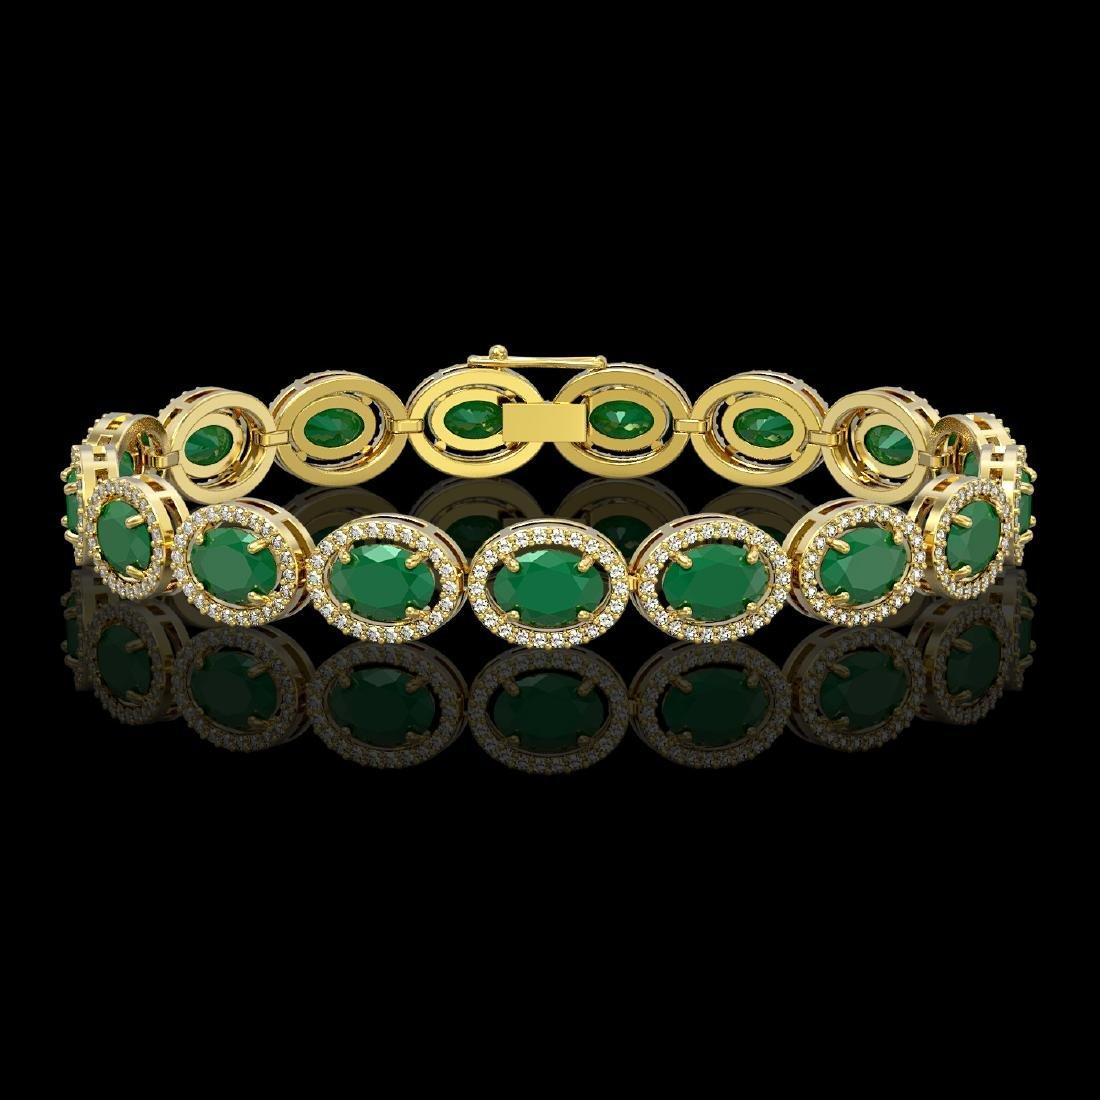 22.89 CTW Emerald & Diamond Halo Bracelet 10K Yellow